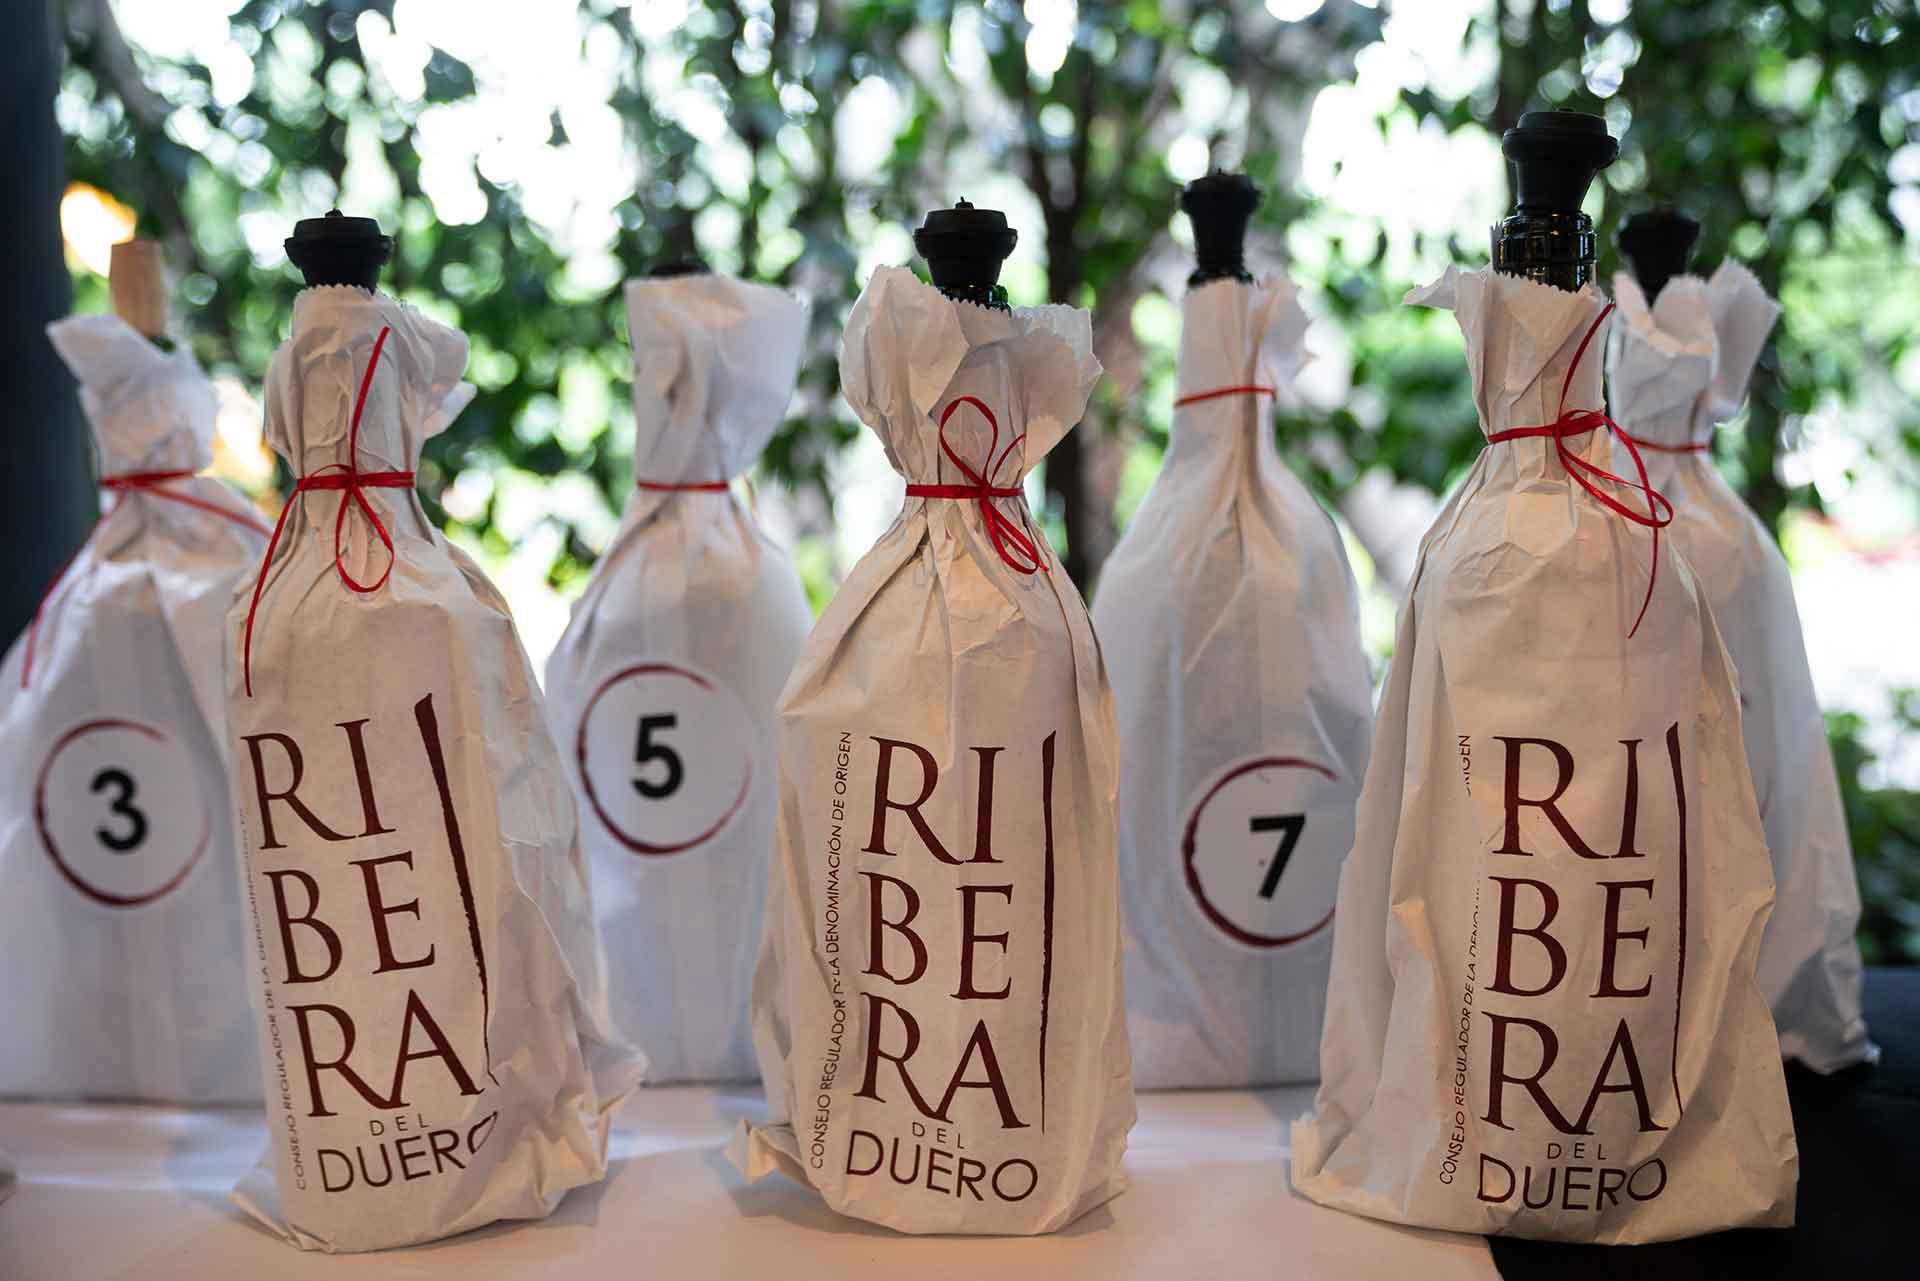 The The Best of Ribera del Duero